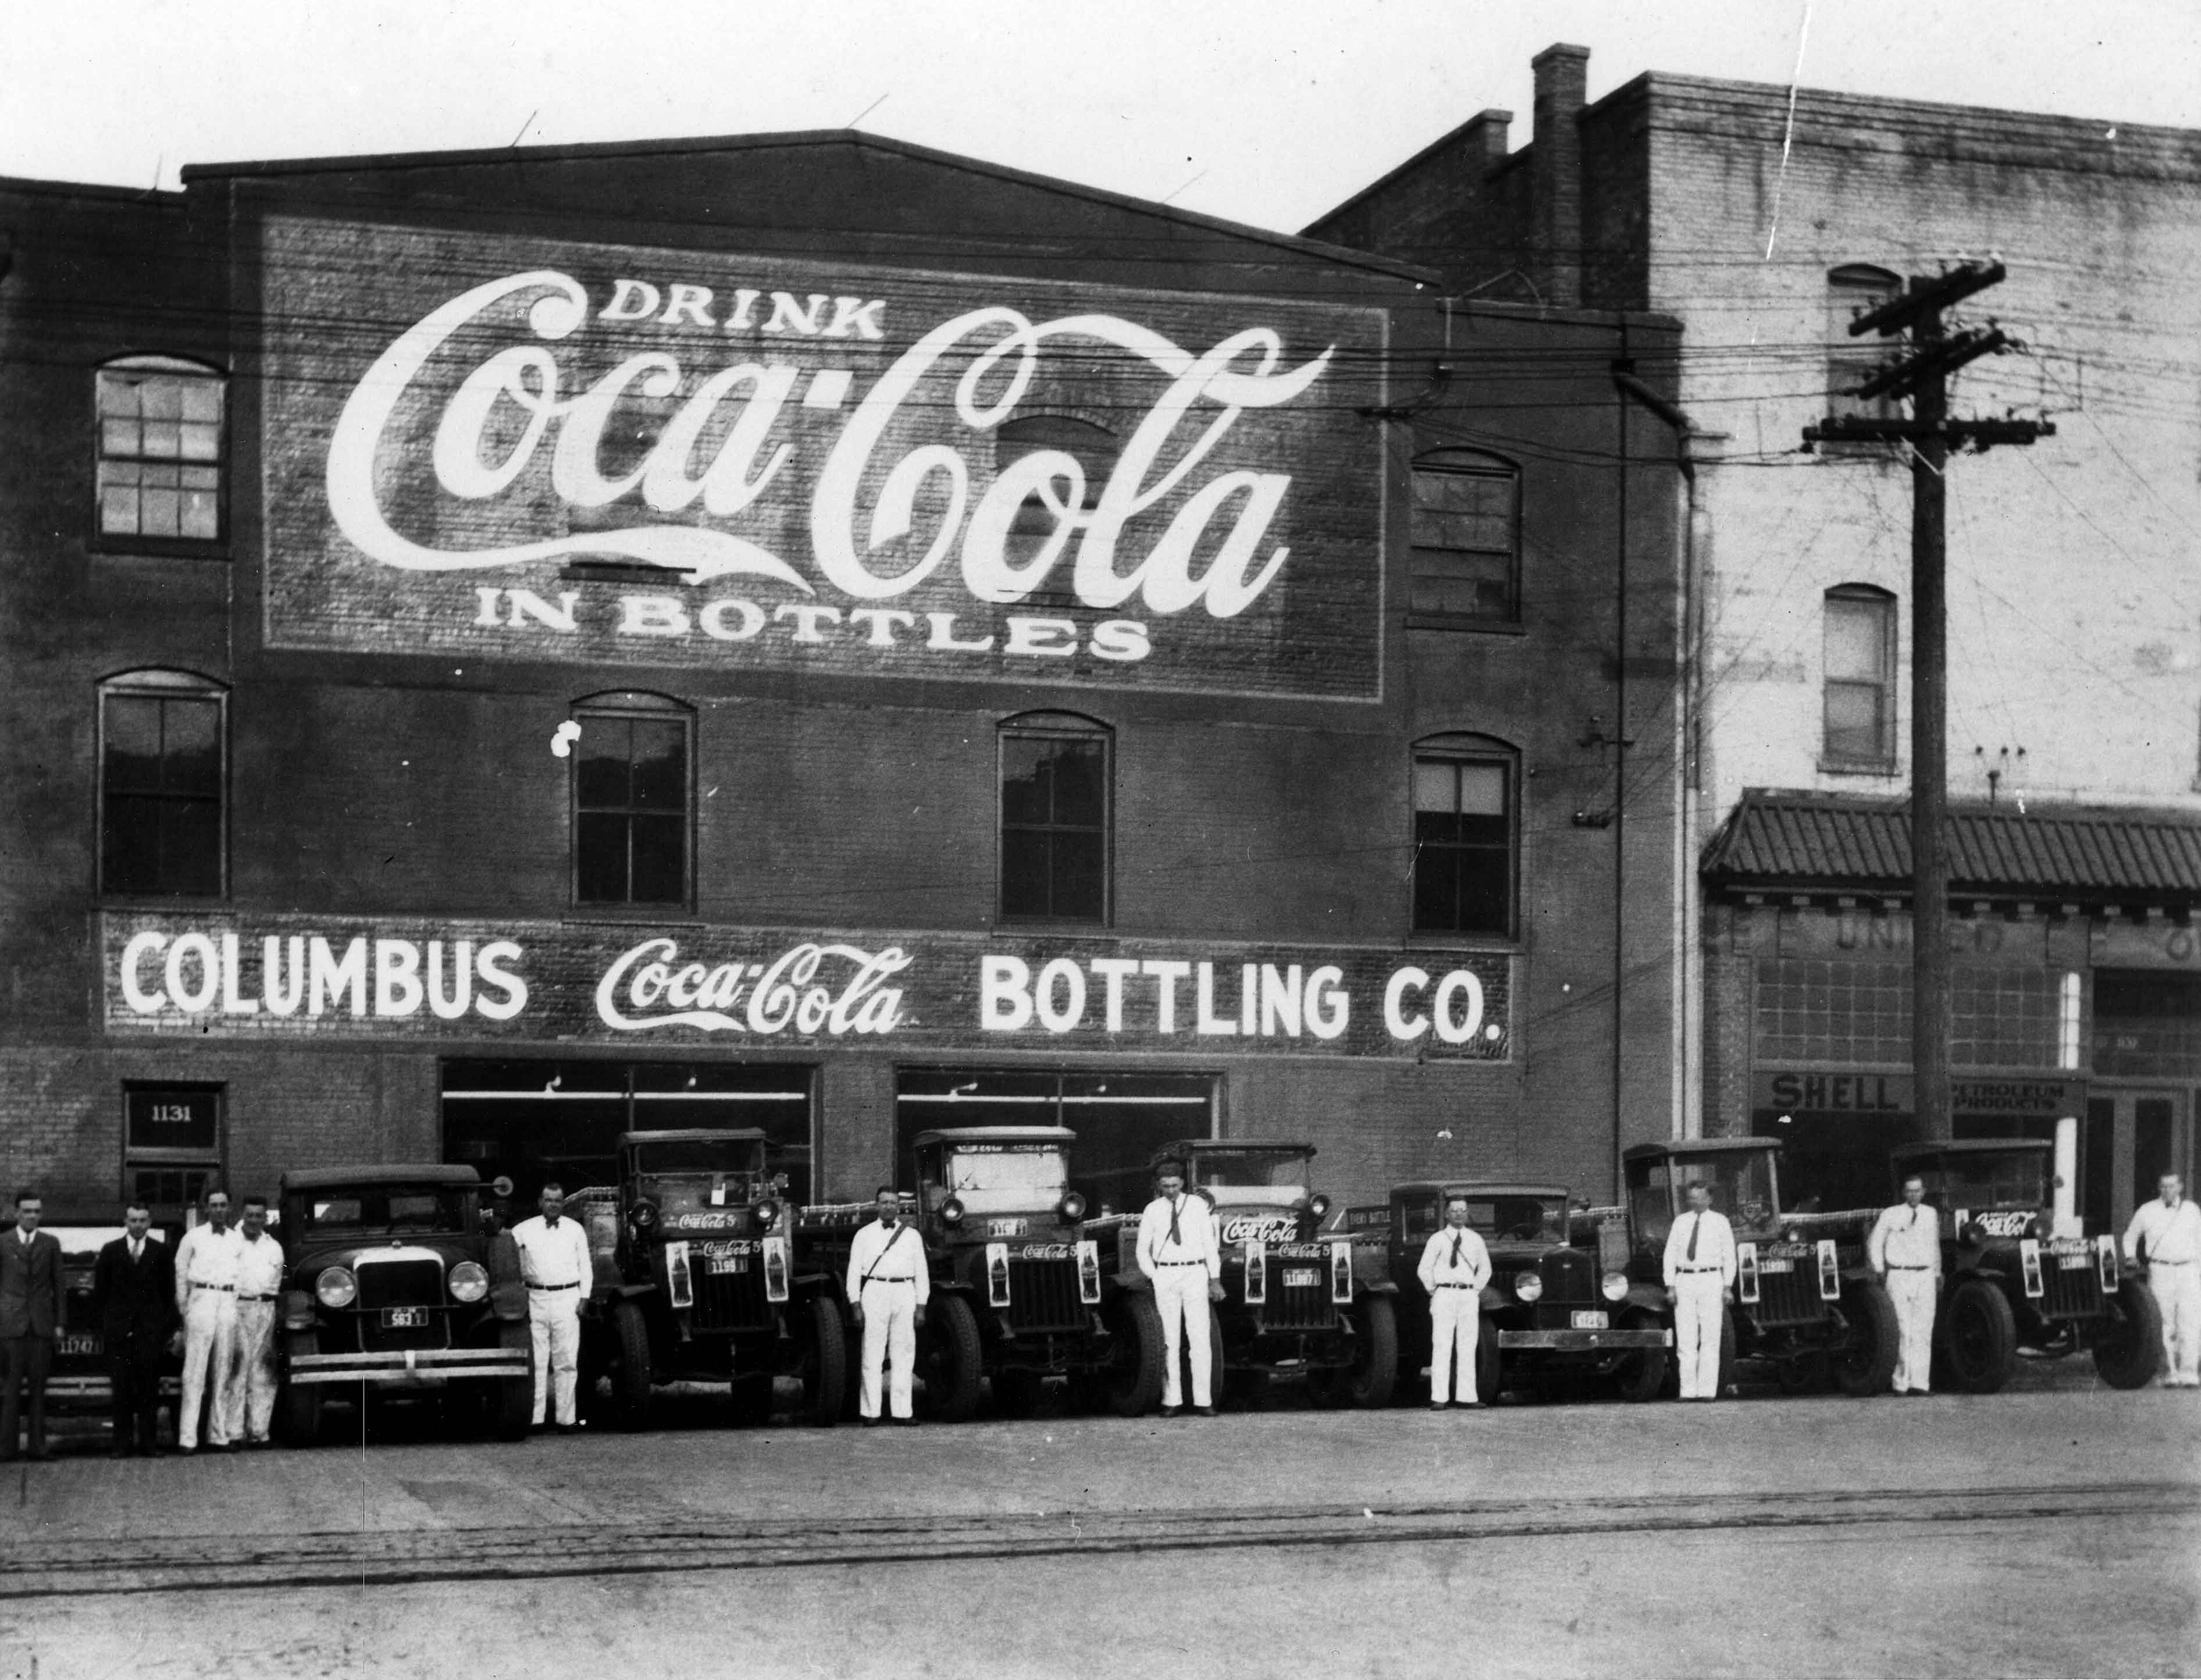 Transportation Company - Coca-Cola - Food Products